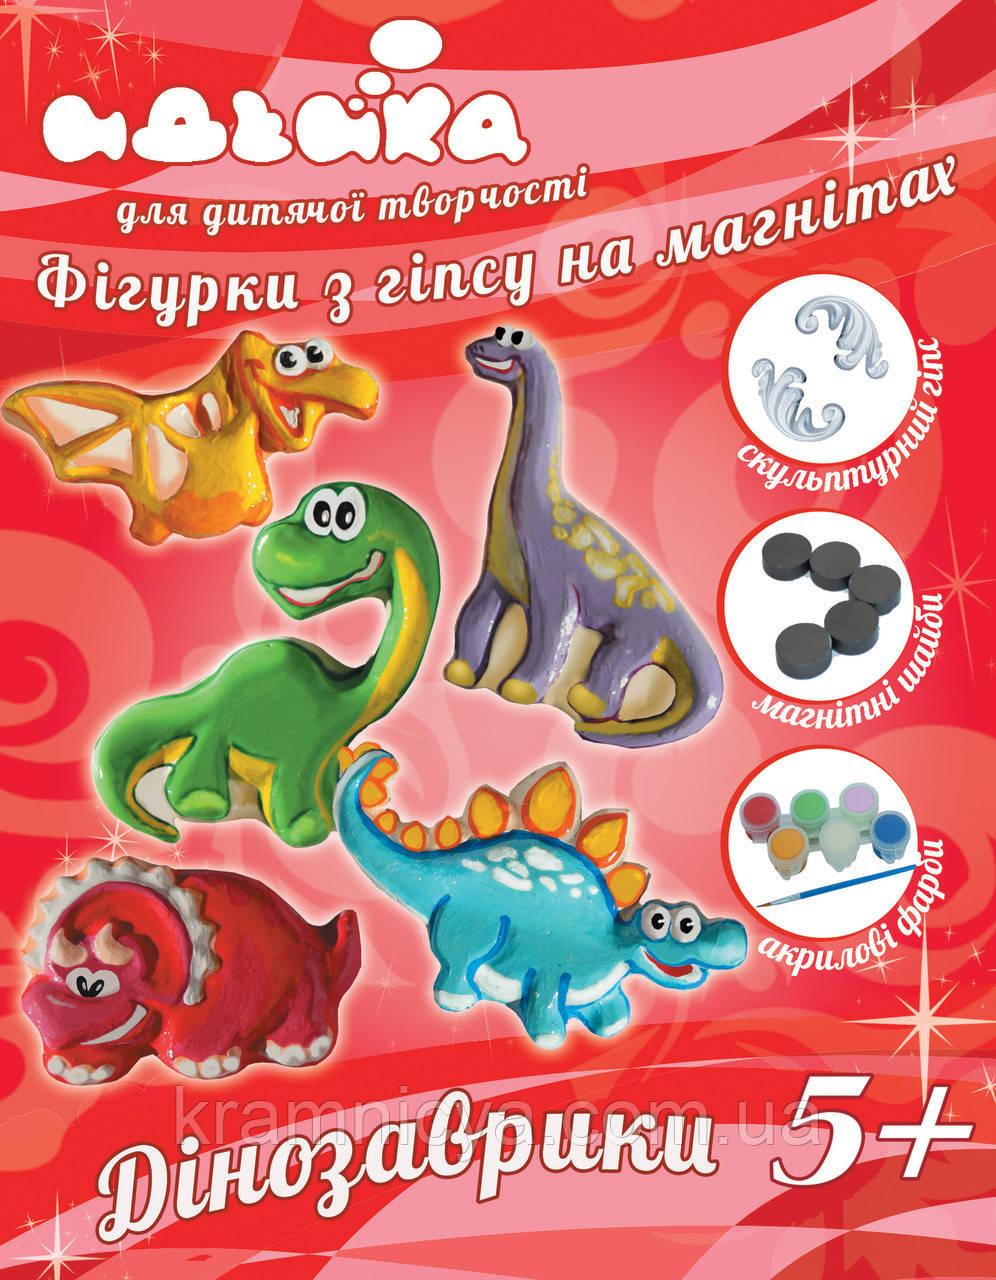 Фигурки из гипса на магнитах. Динозаврики (94123)